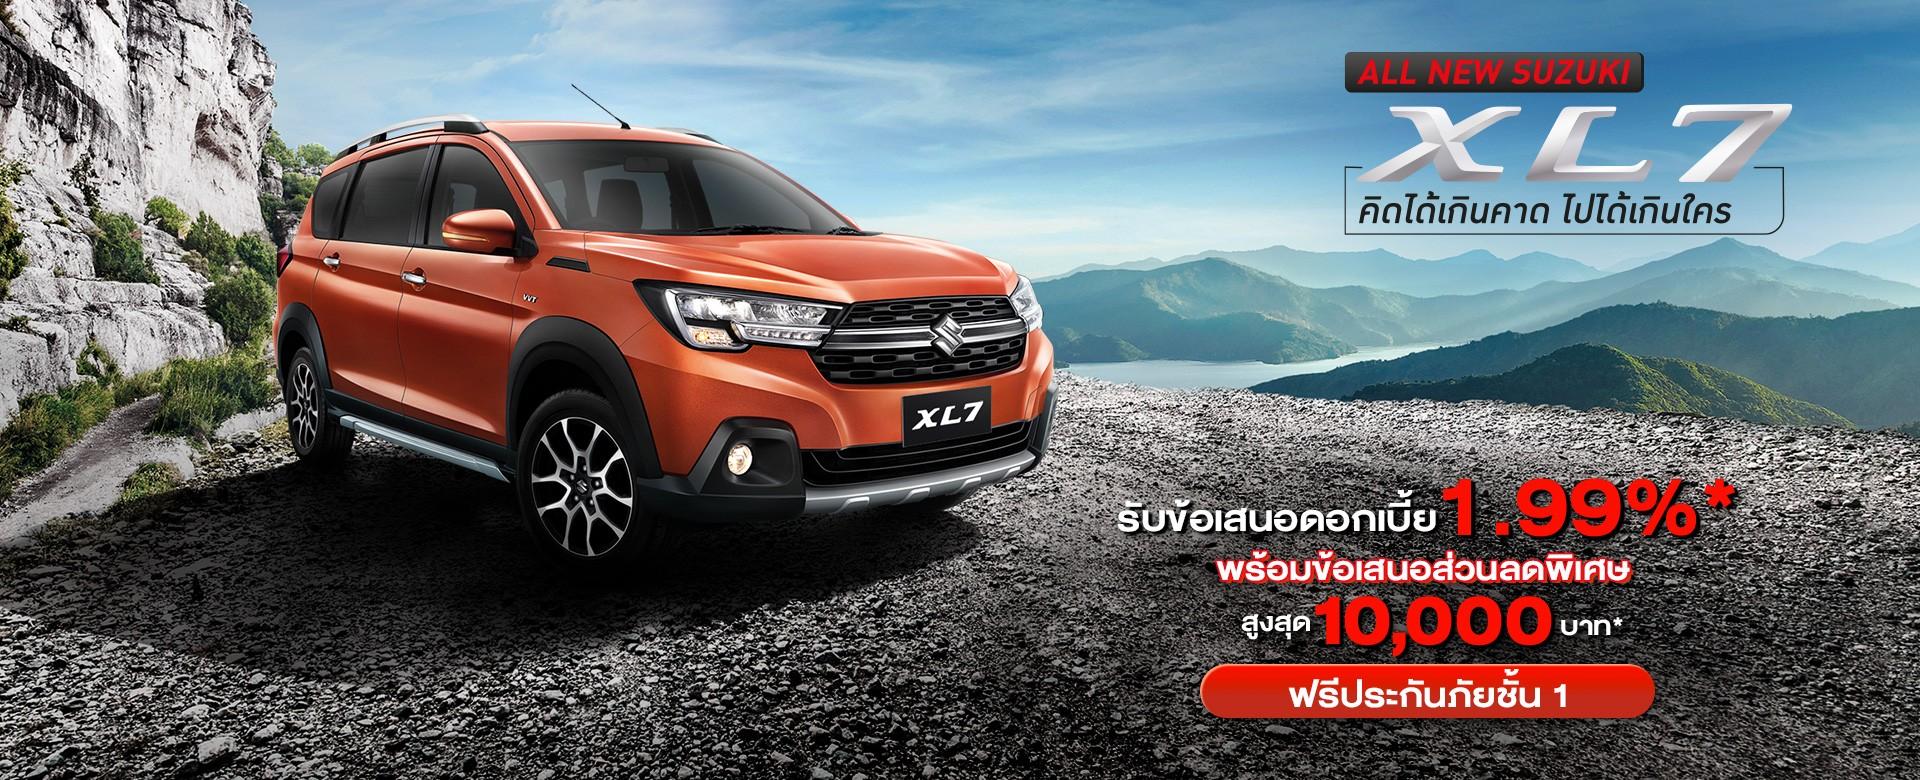 All New Suzuki XL7 โปรโมชั่น